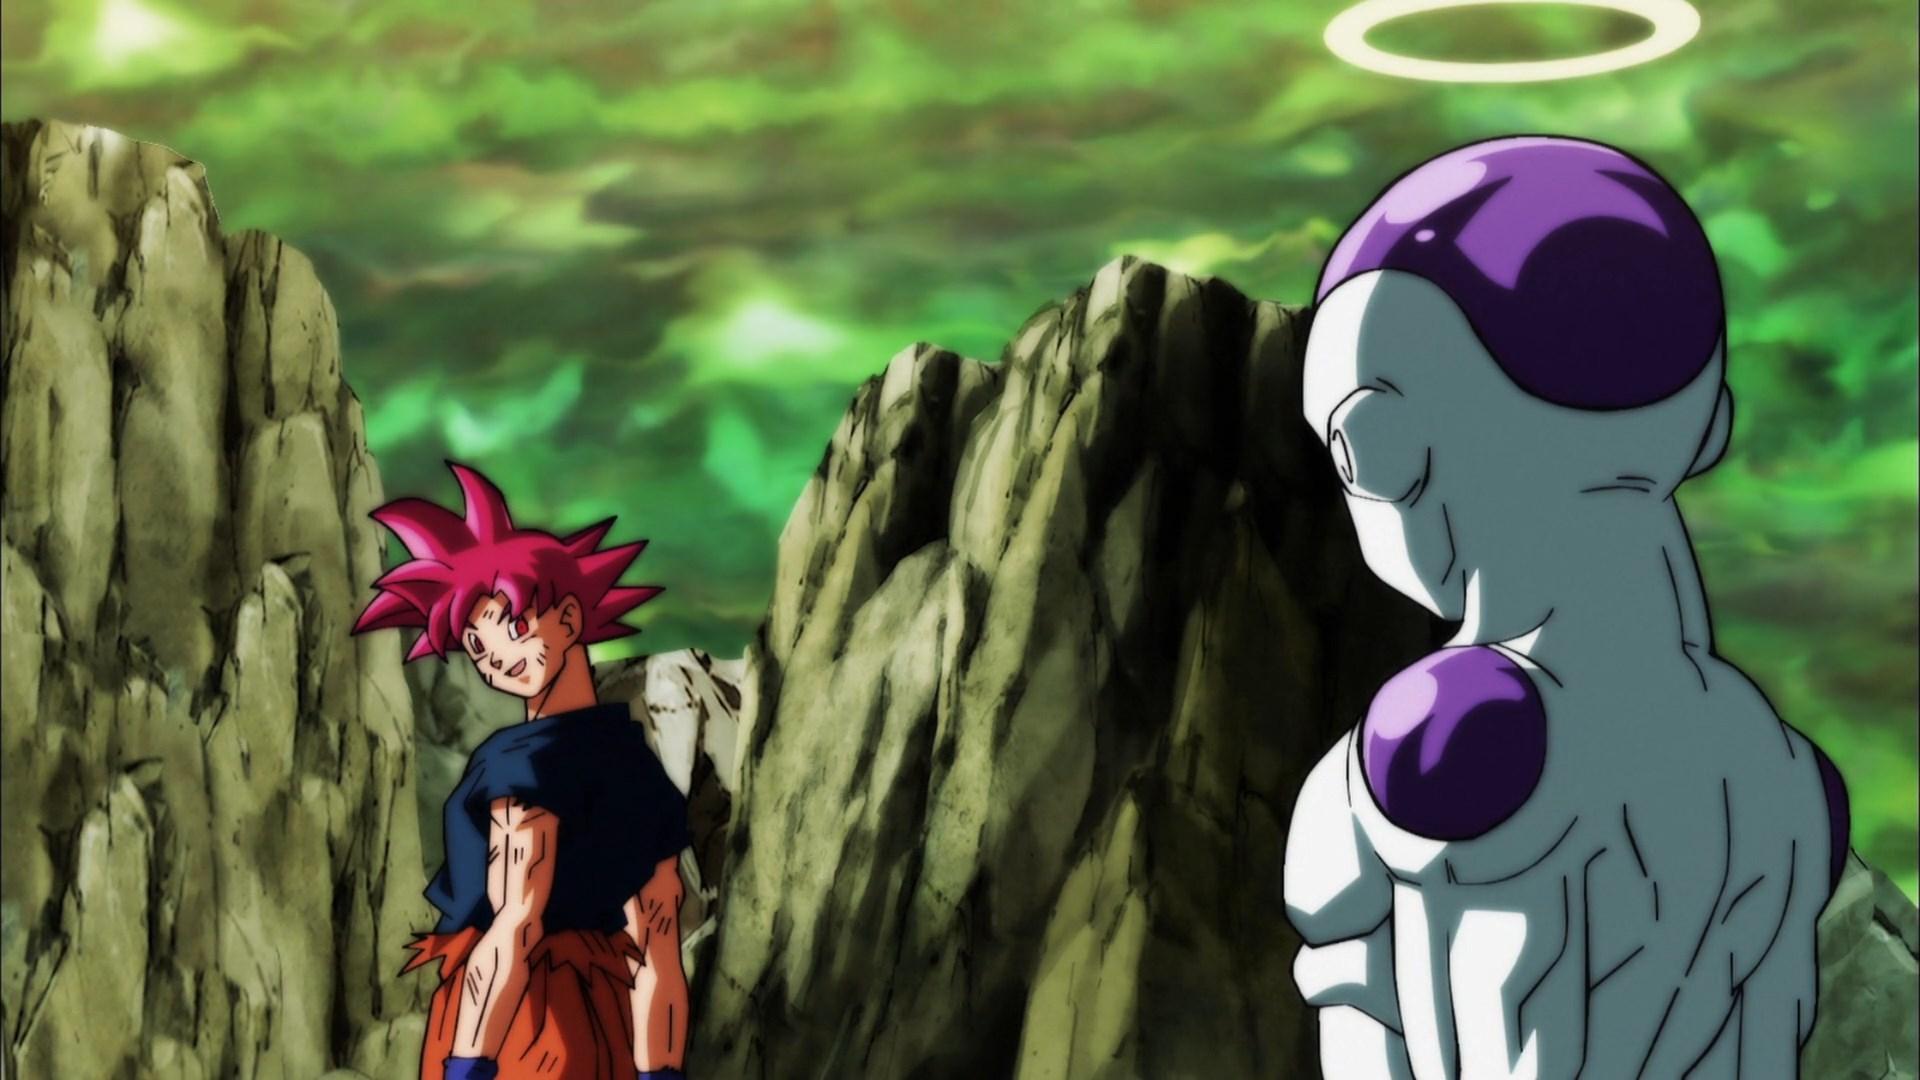 [HorribleSubs] Dragon Ball Super - 121 [1080p].mkv_snapshot_12.10